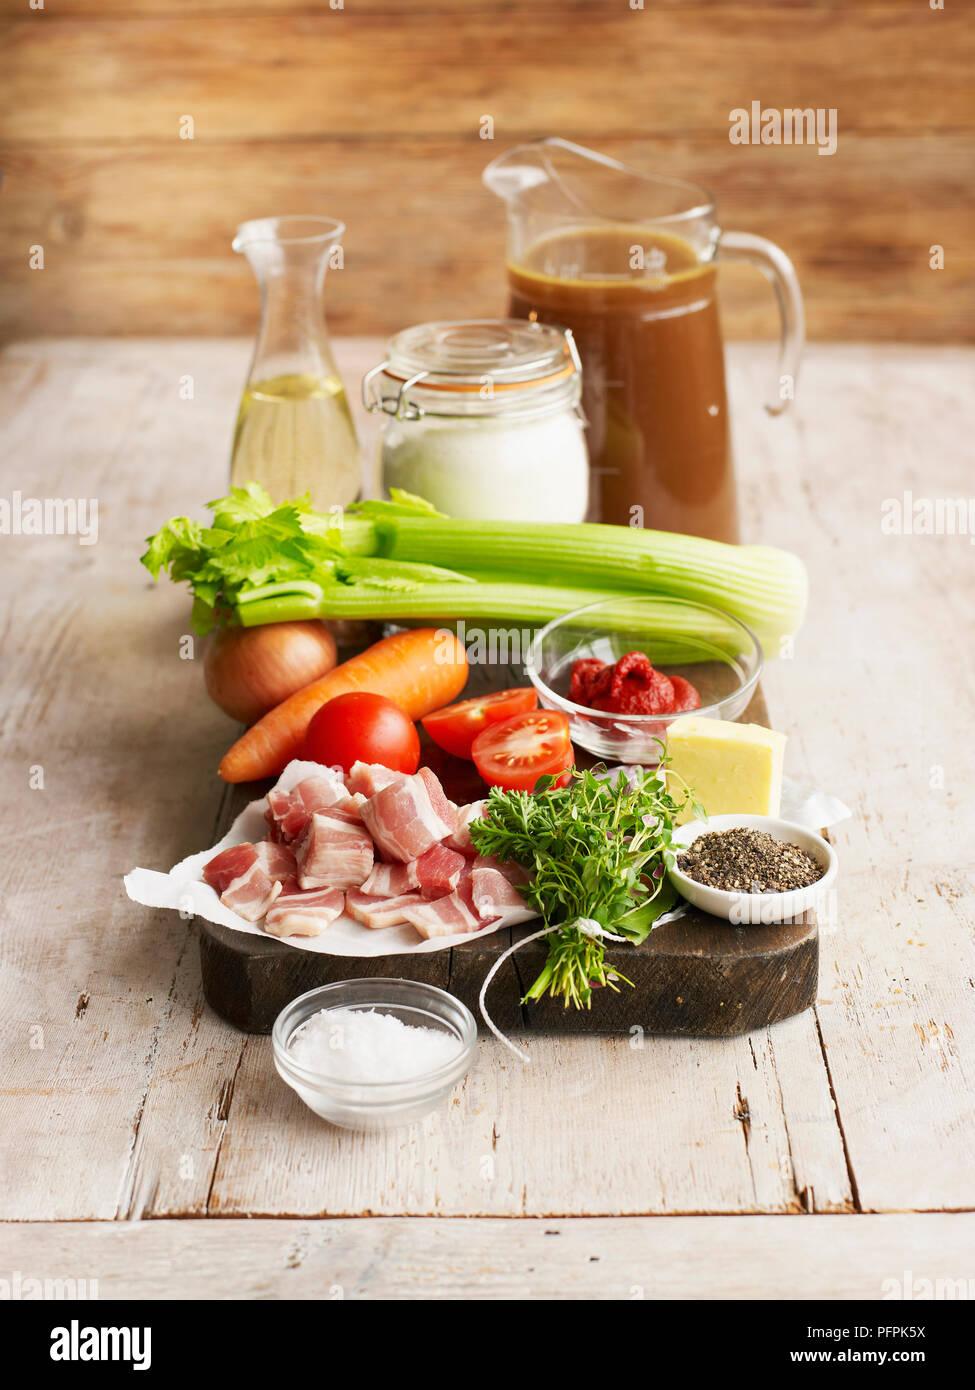 Ingredients for espagnole sauce, including jug of meat stock, vegetables, bouquet garni, pepper and salt, flour - Stock Image